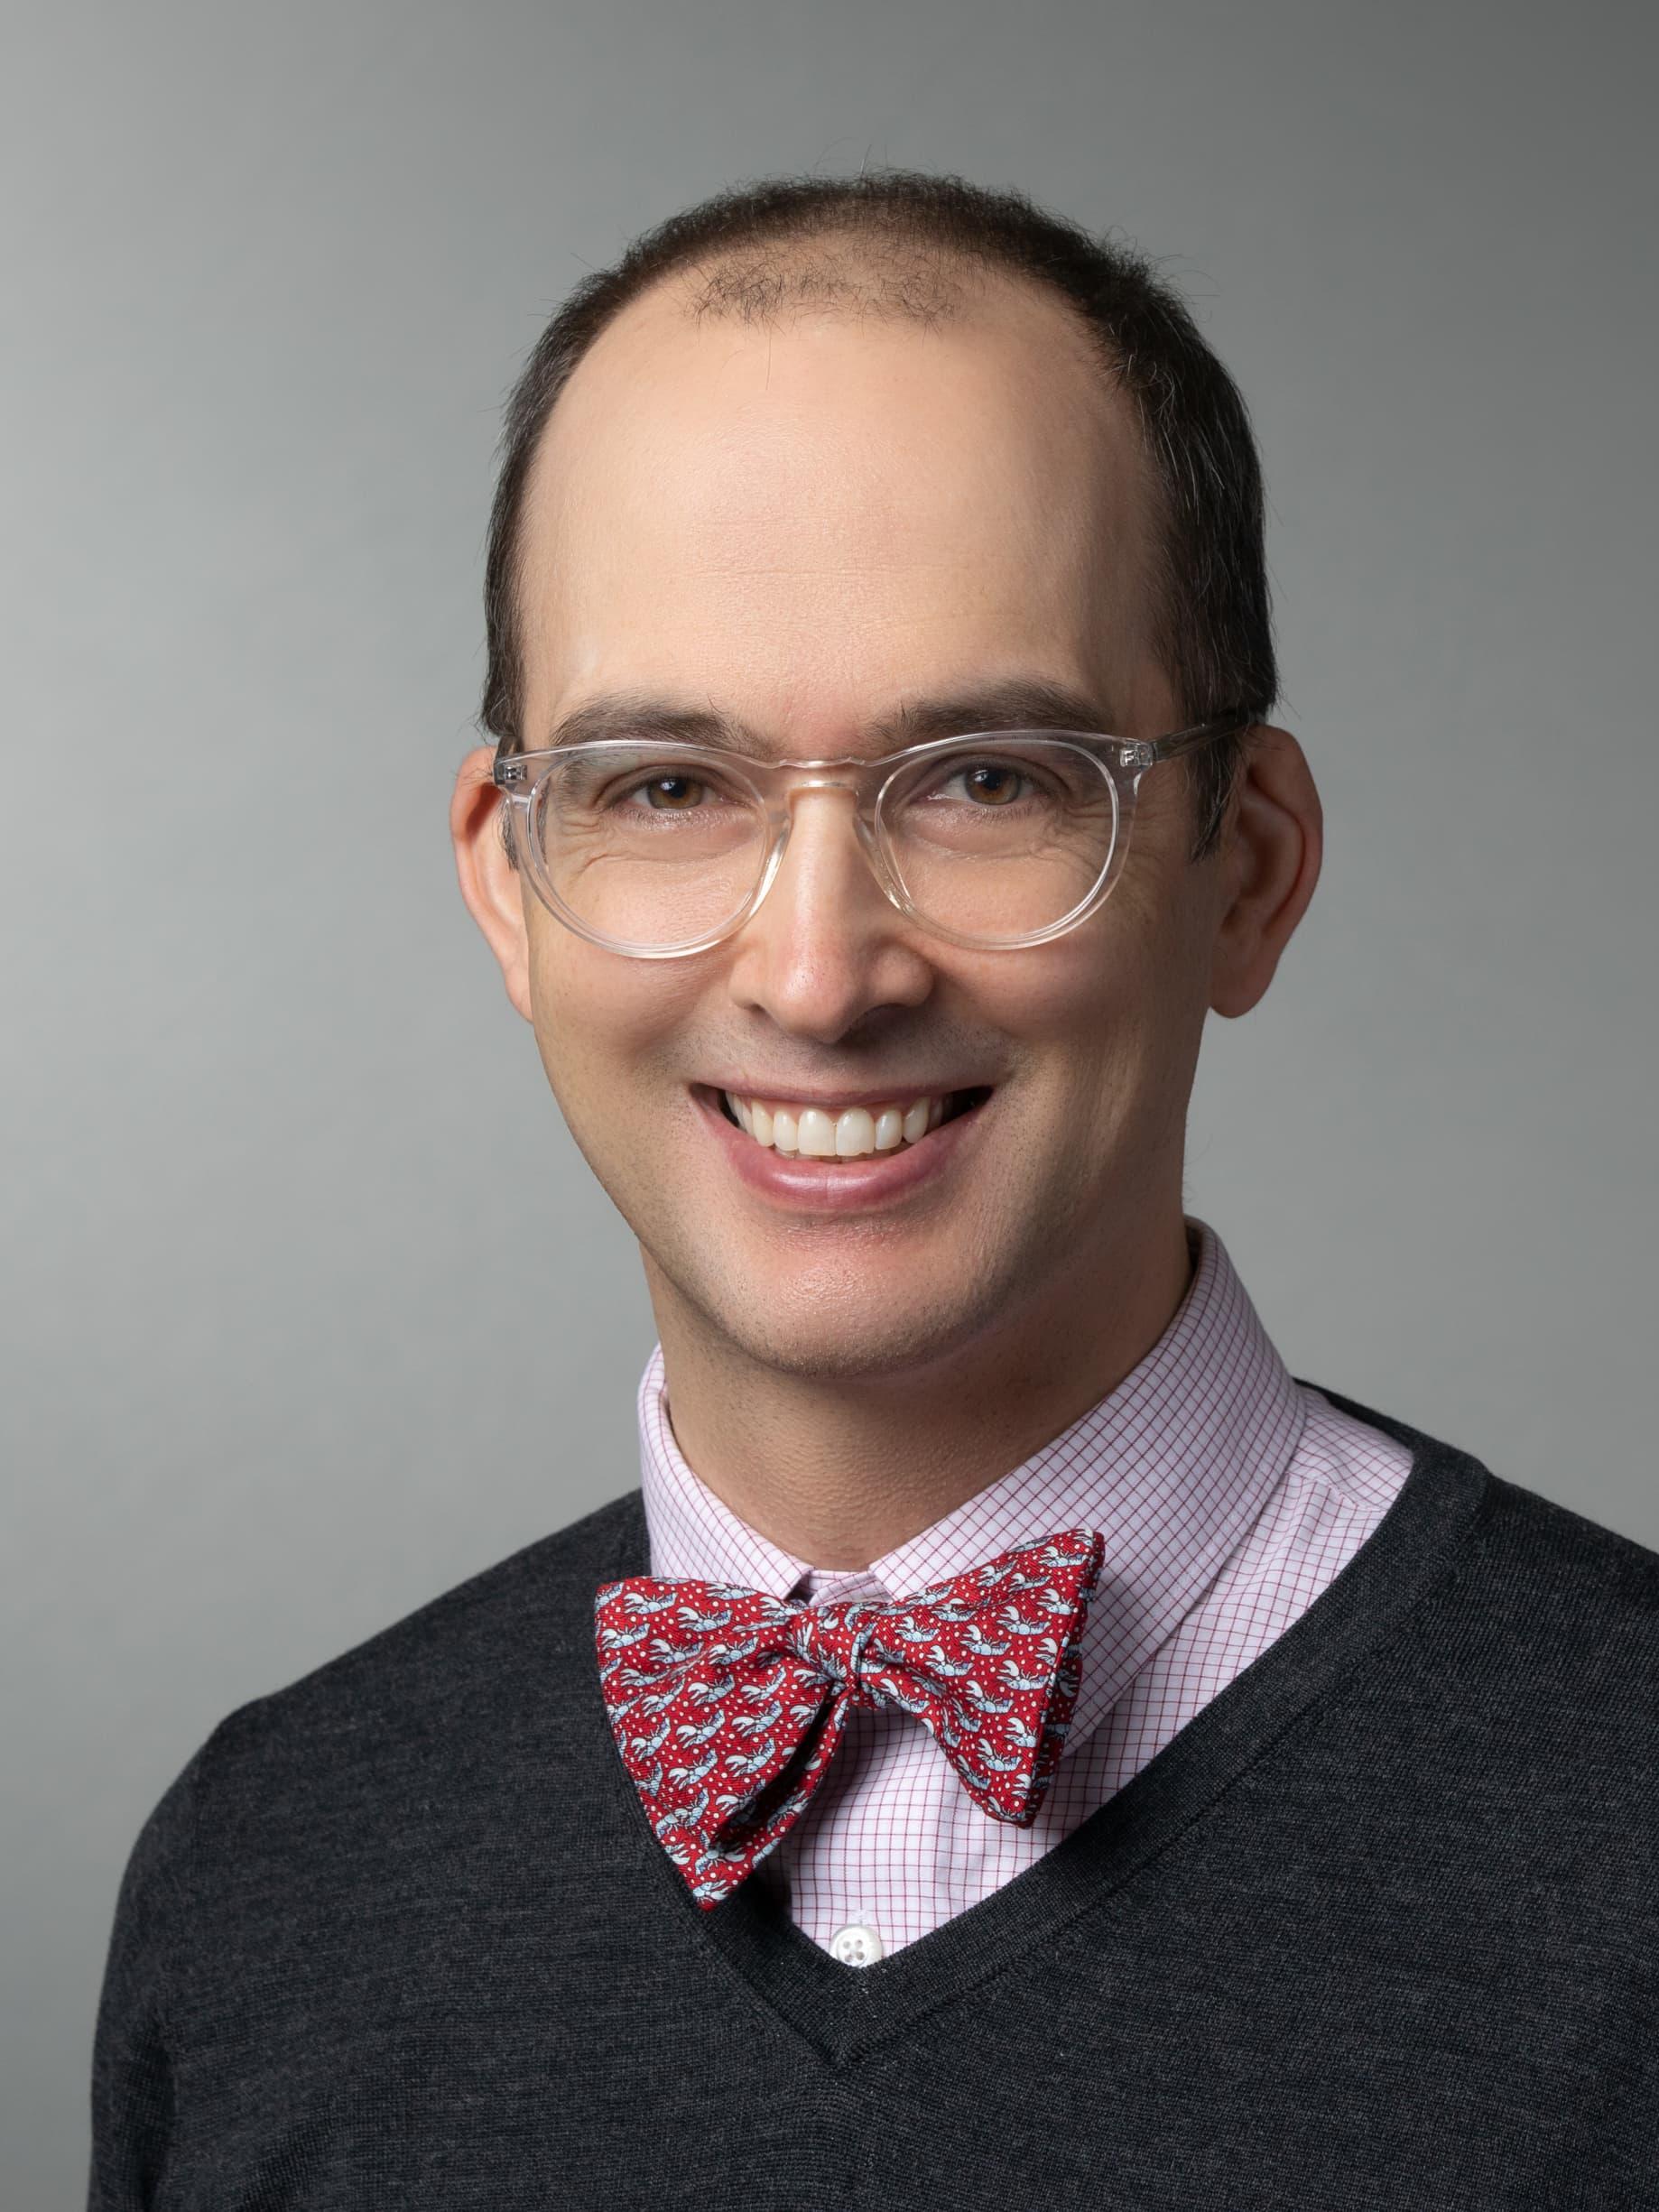 Jeremy J. Moeller